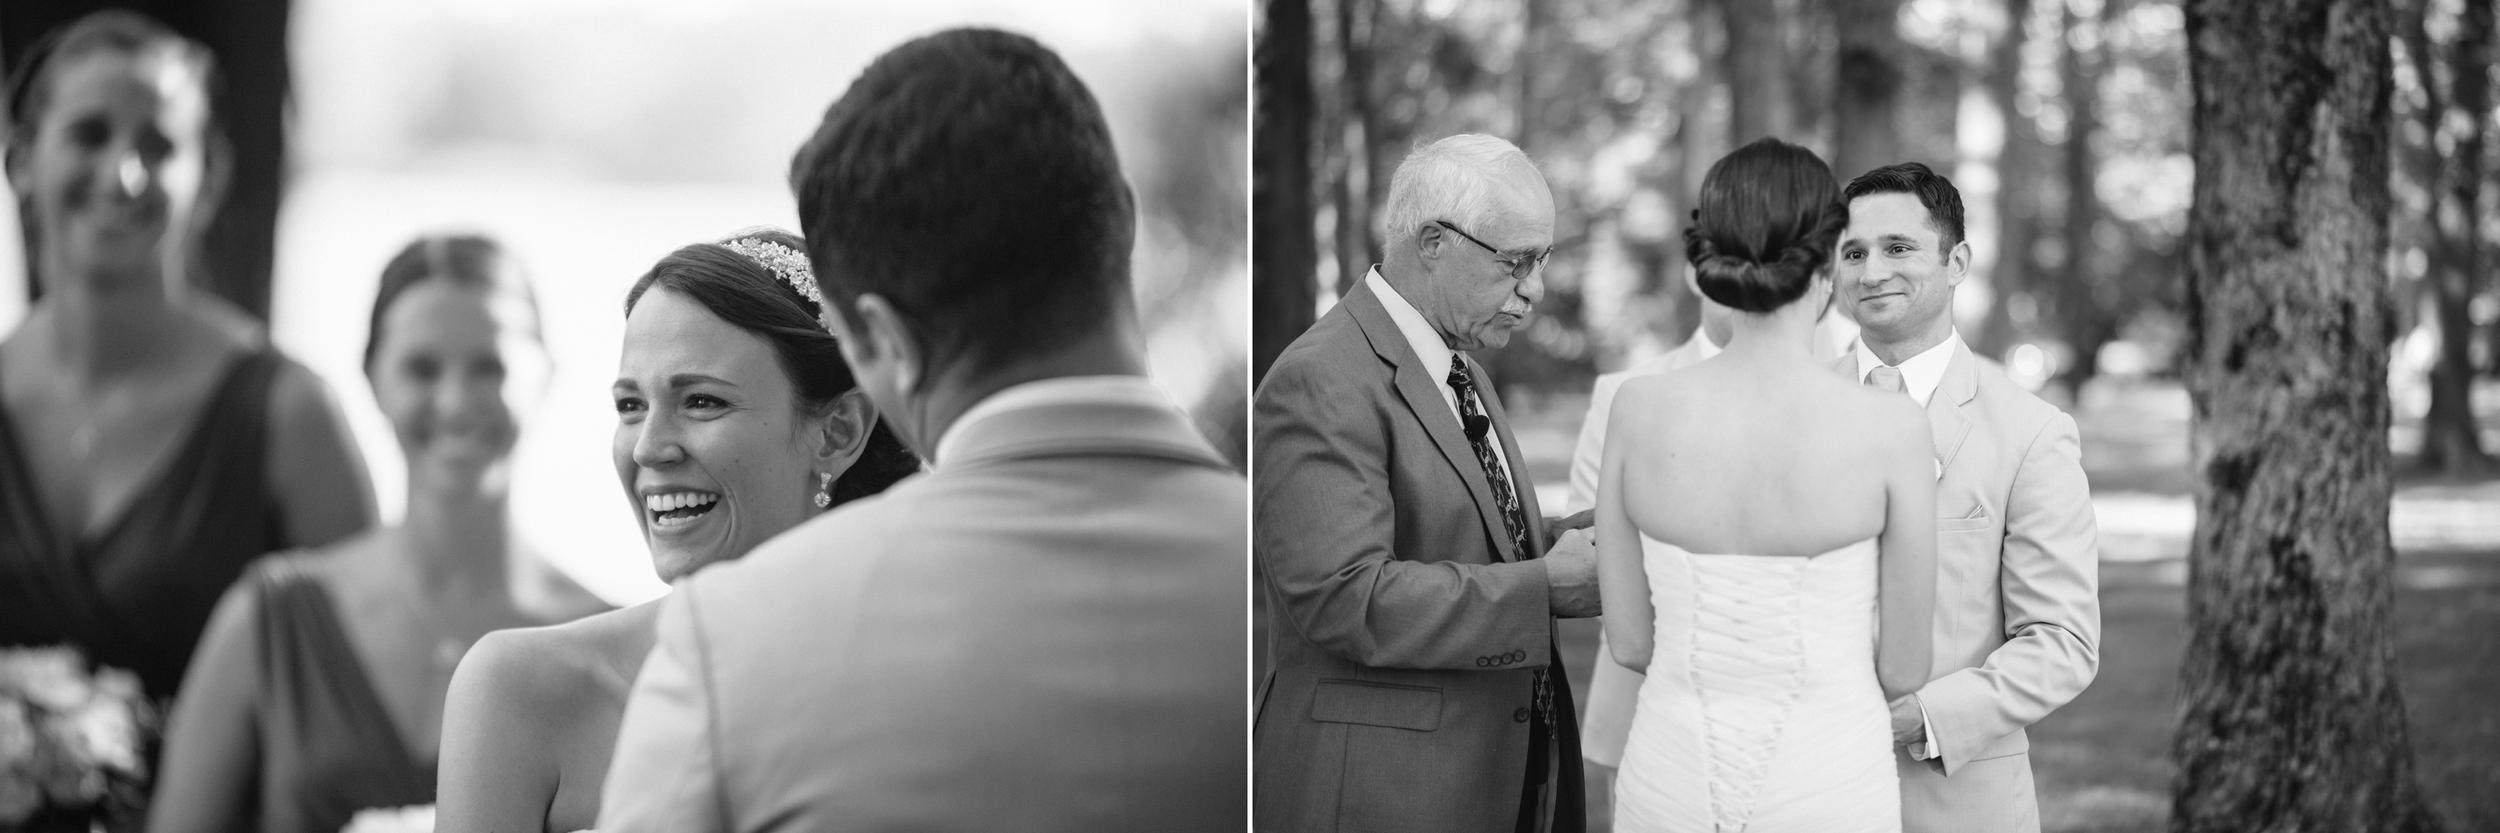 Matt_Swetel_Photography_Erin_and_Jeff_married036.jpg